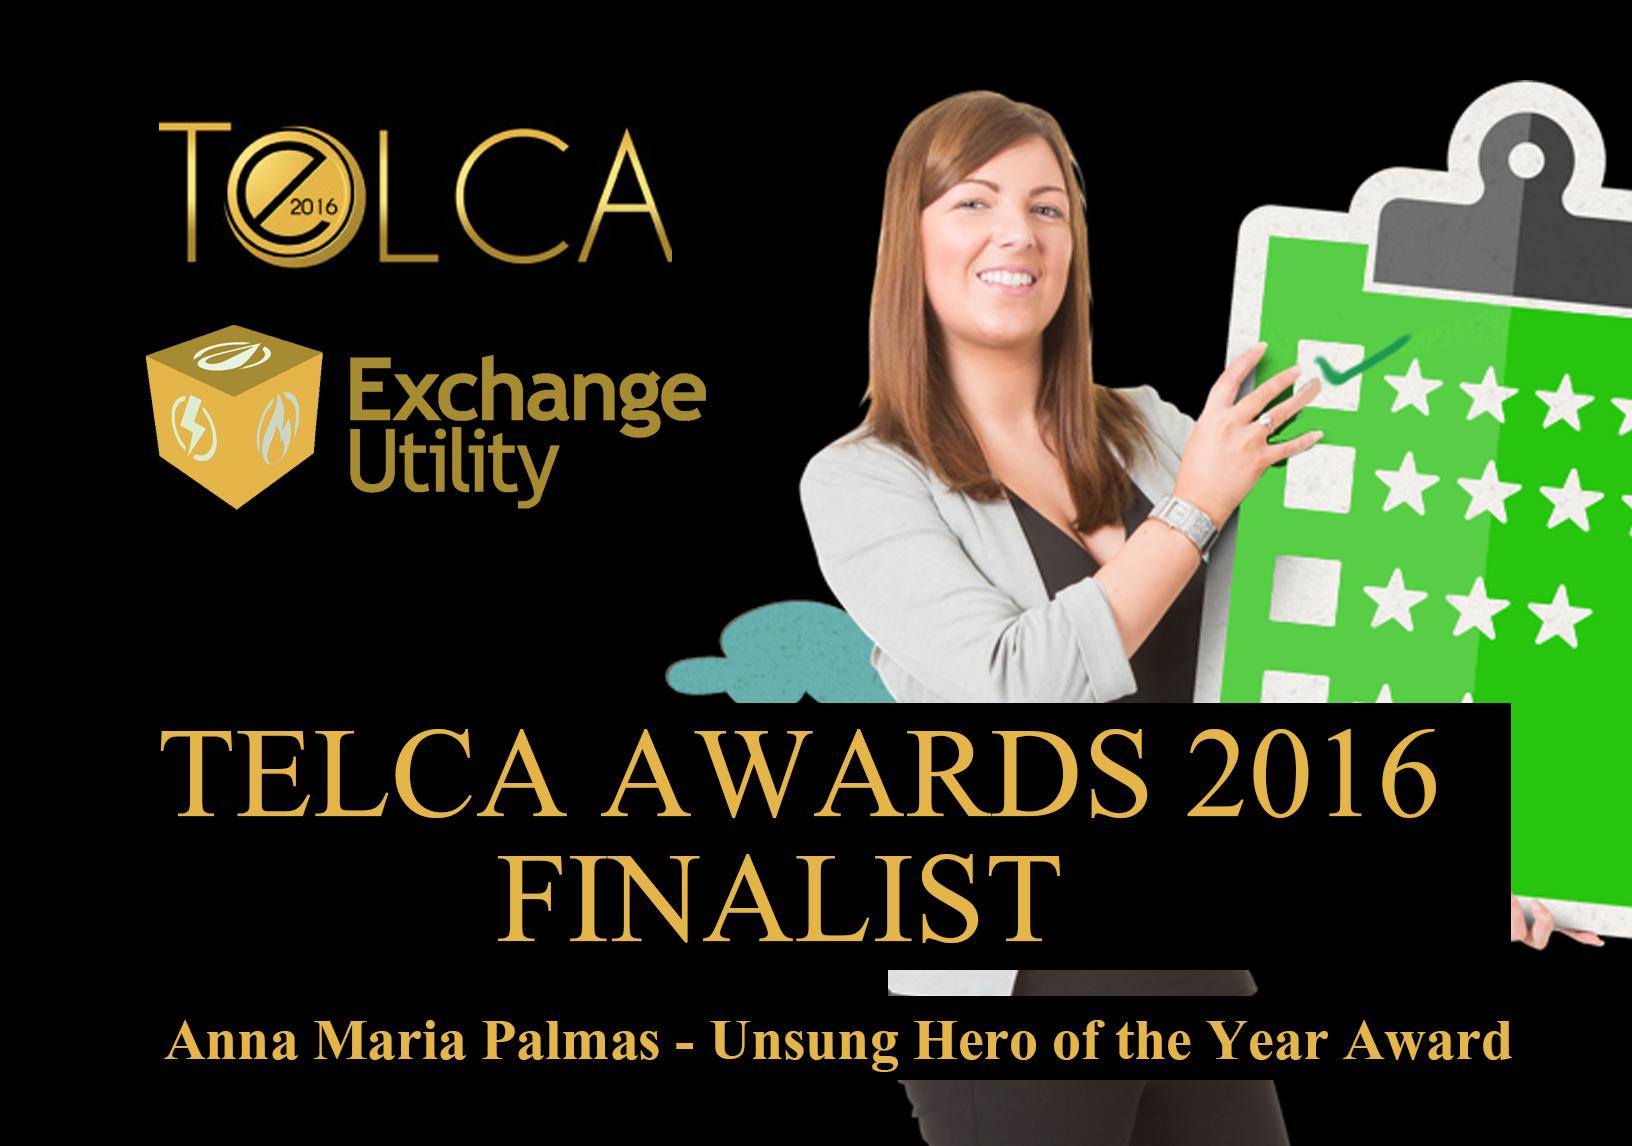 Unsung Hero TELCA Finalist 2016 Anna Maria Palmas